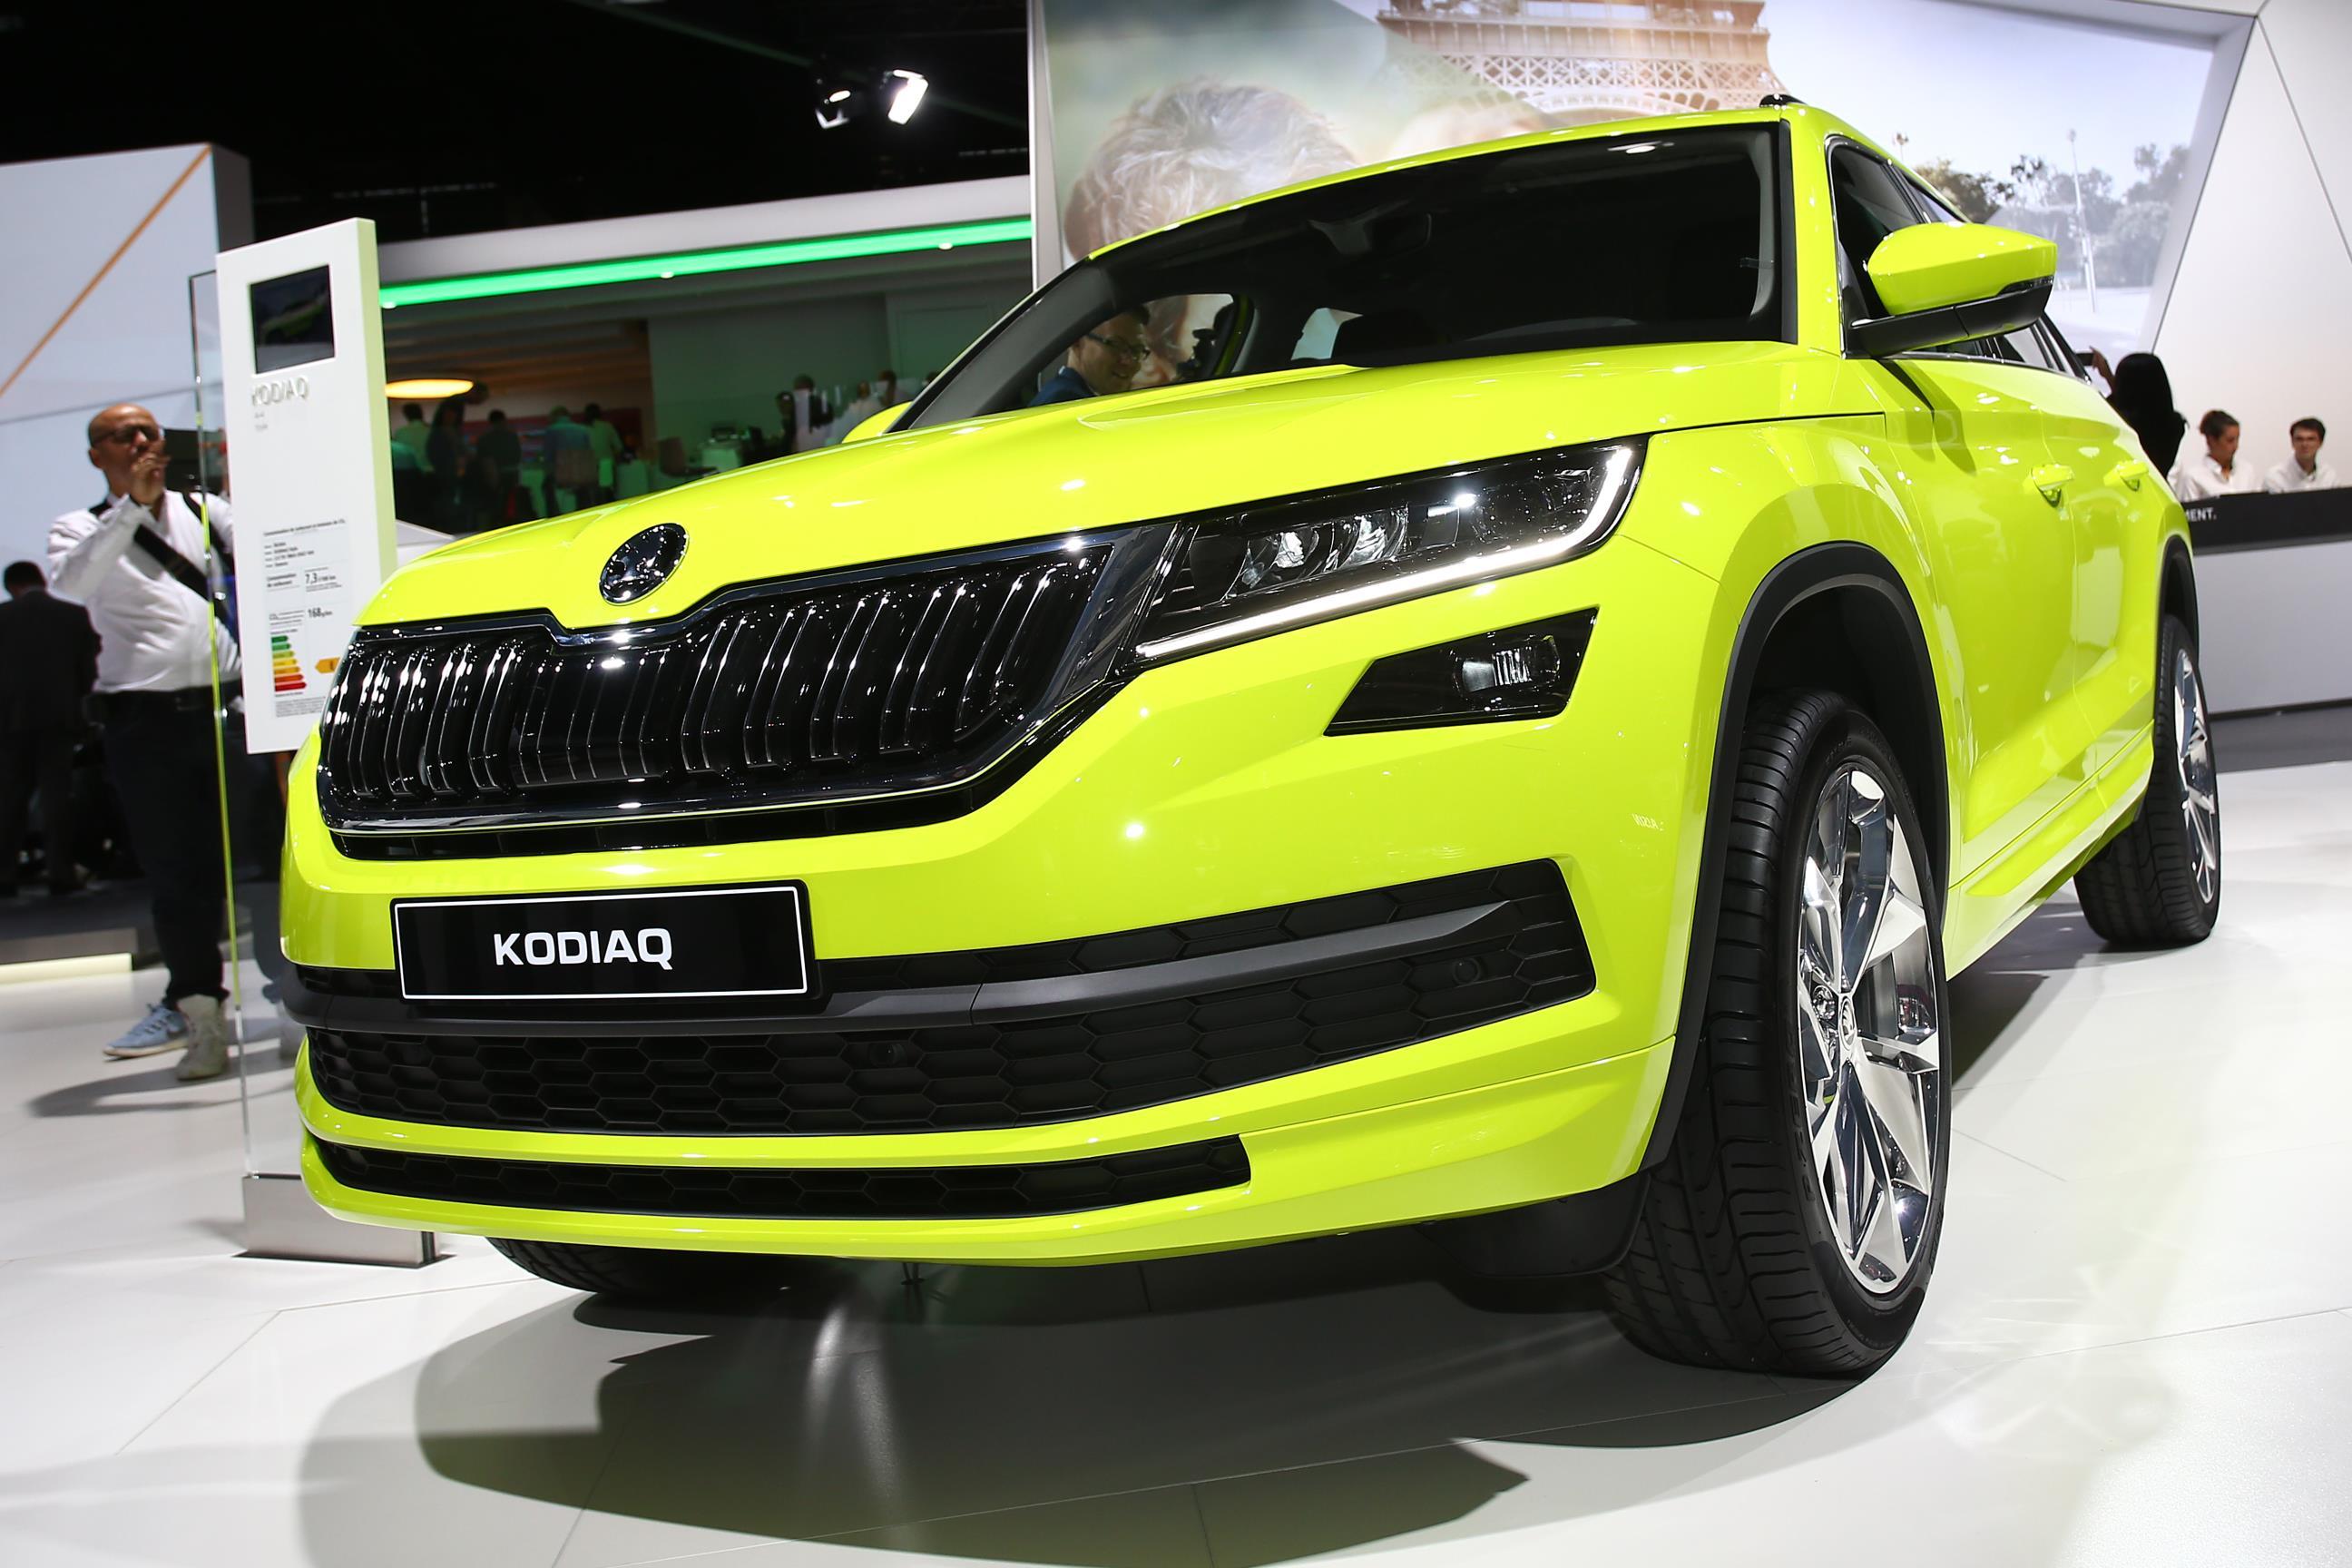 skoda kodiaq brings speed yellowgreen paint and door. Black Bedroom Furniture Sets. Home Design Ideas